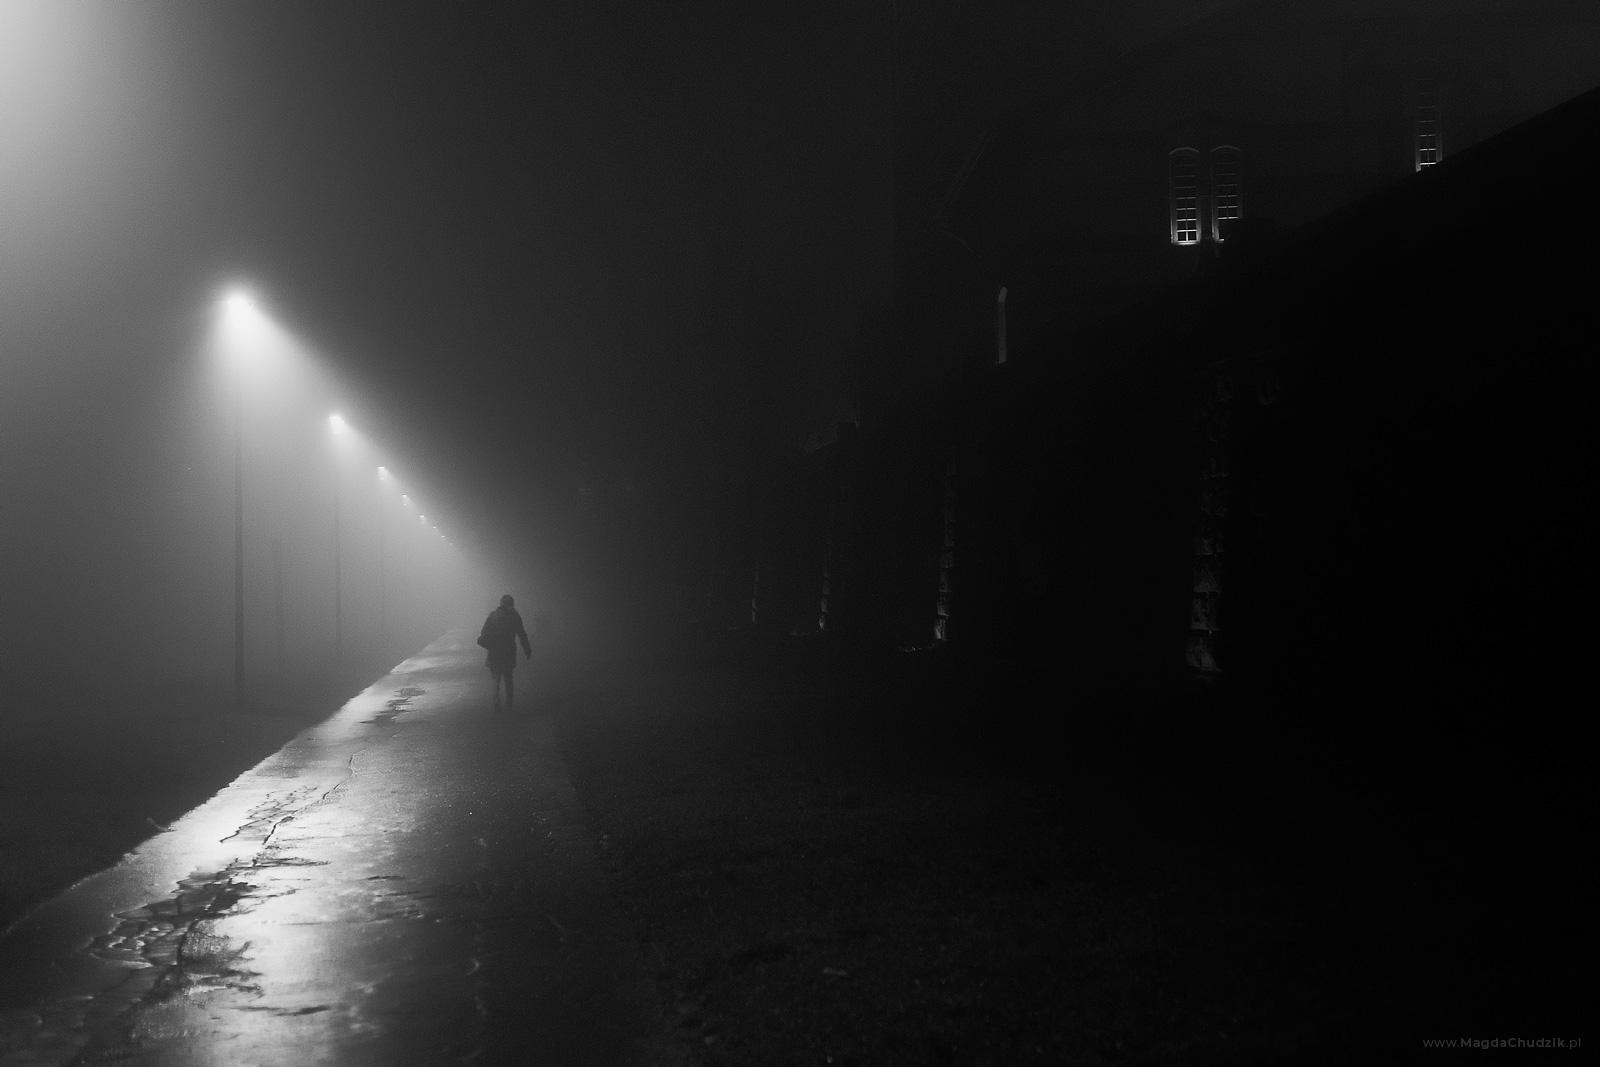 magda-chudzik-street-photography-poland-krakow-069